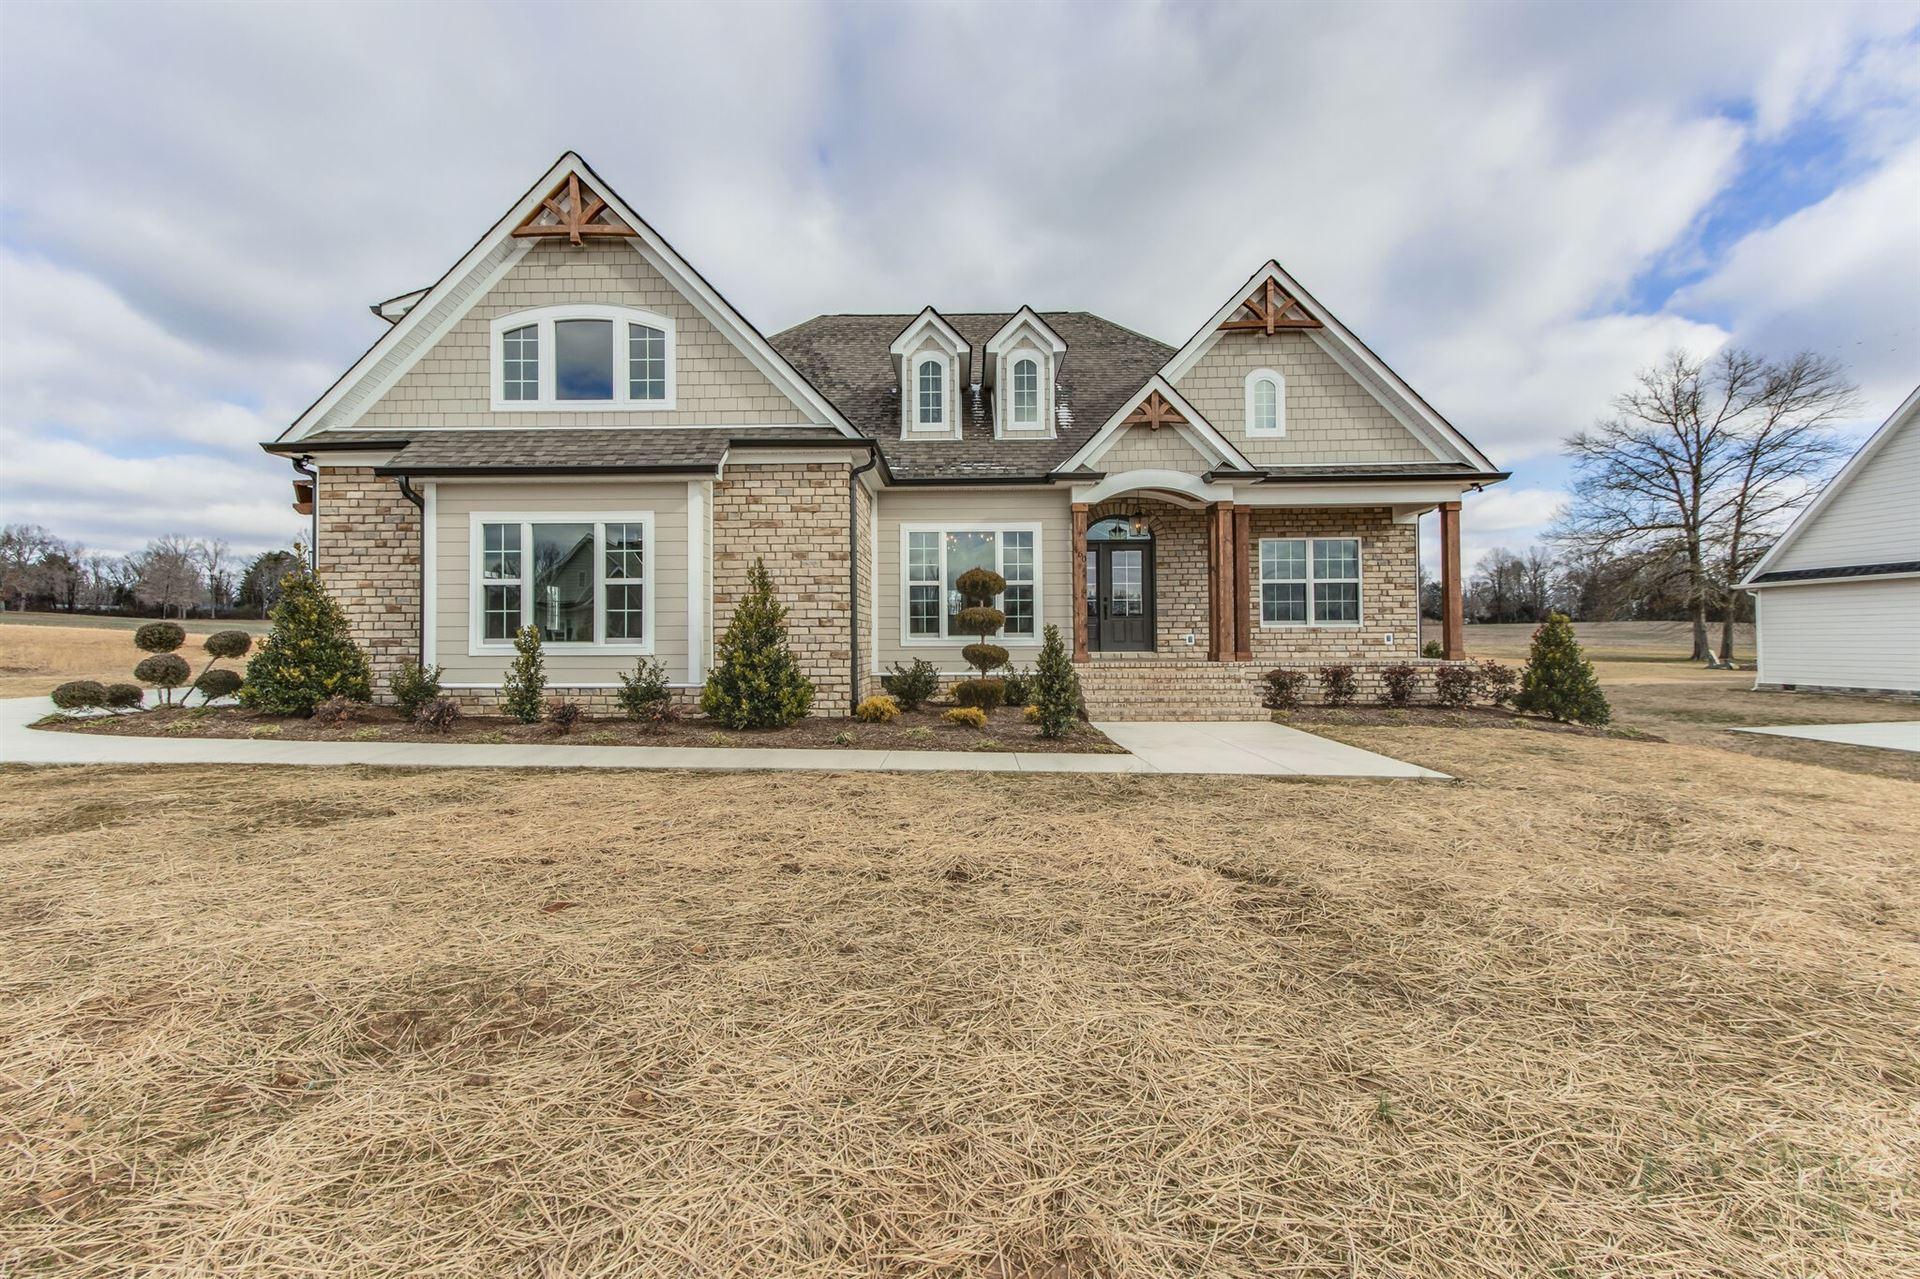 160 Stone creek Blvd, McMinnville, TN 37110 - MLS#: 2209496